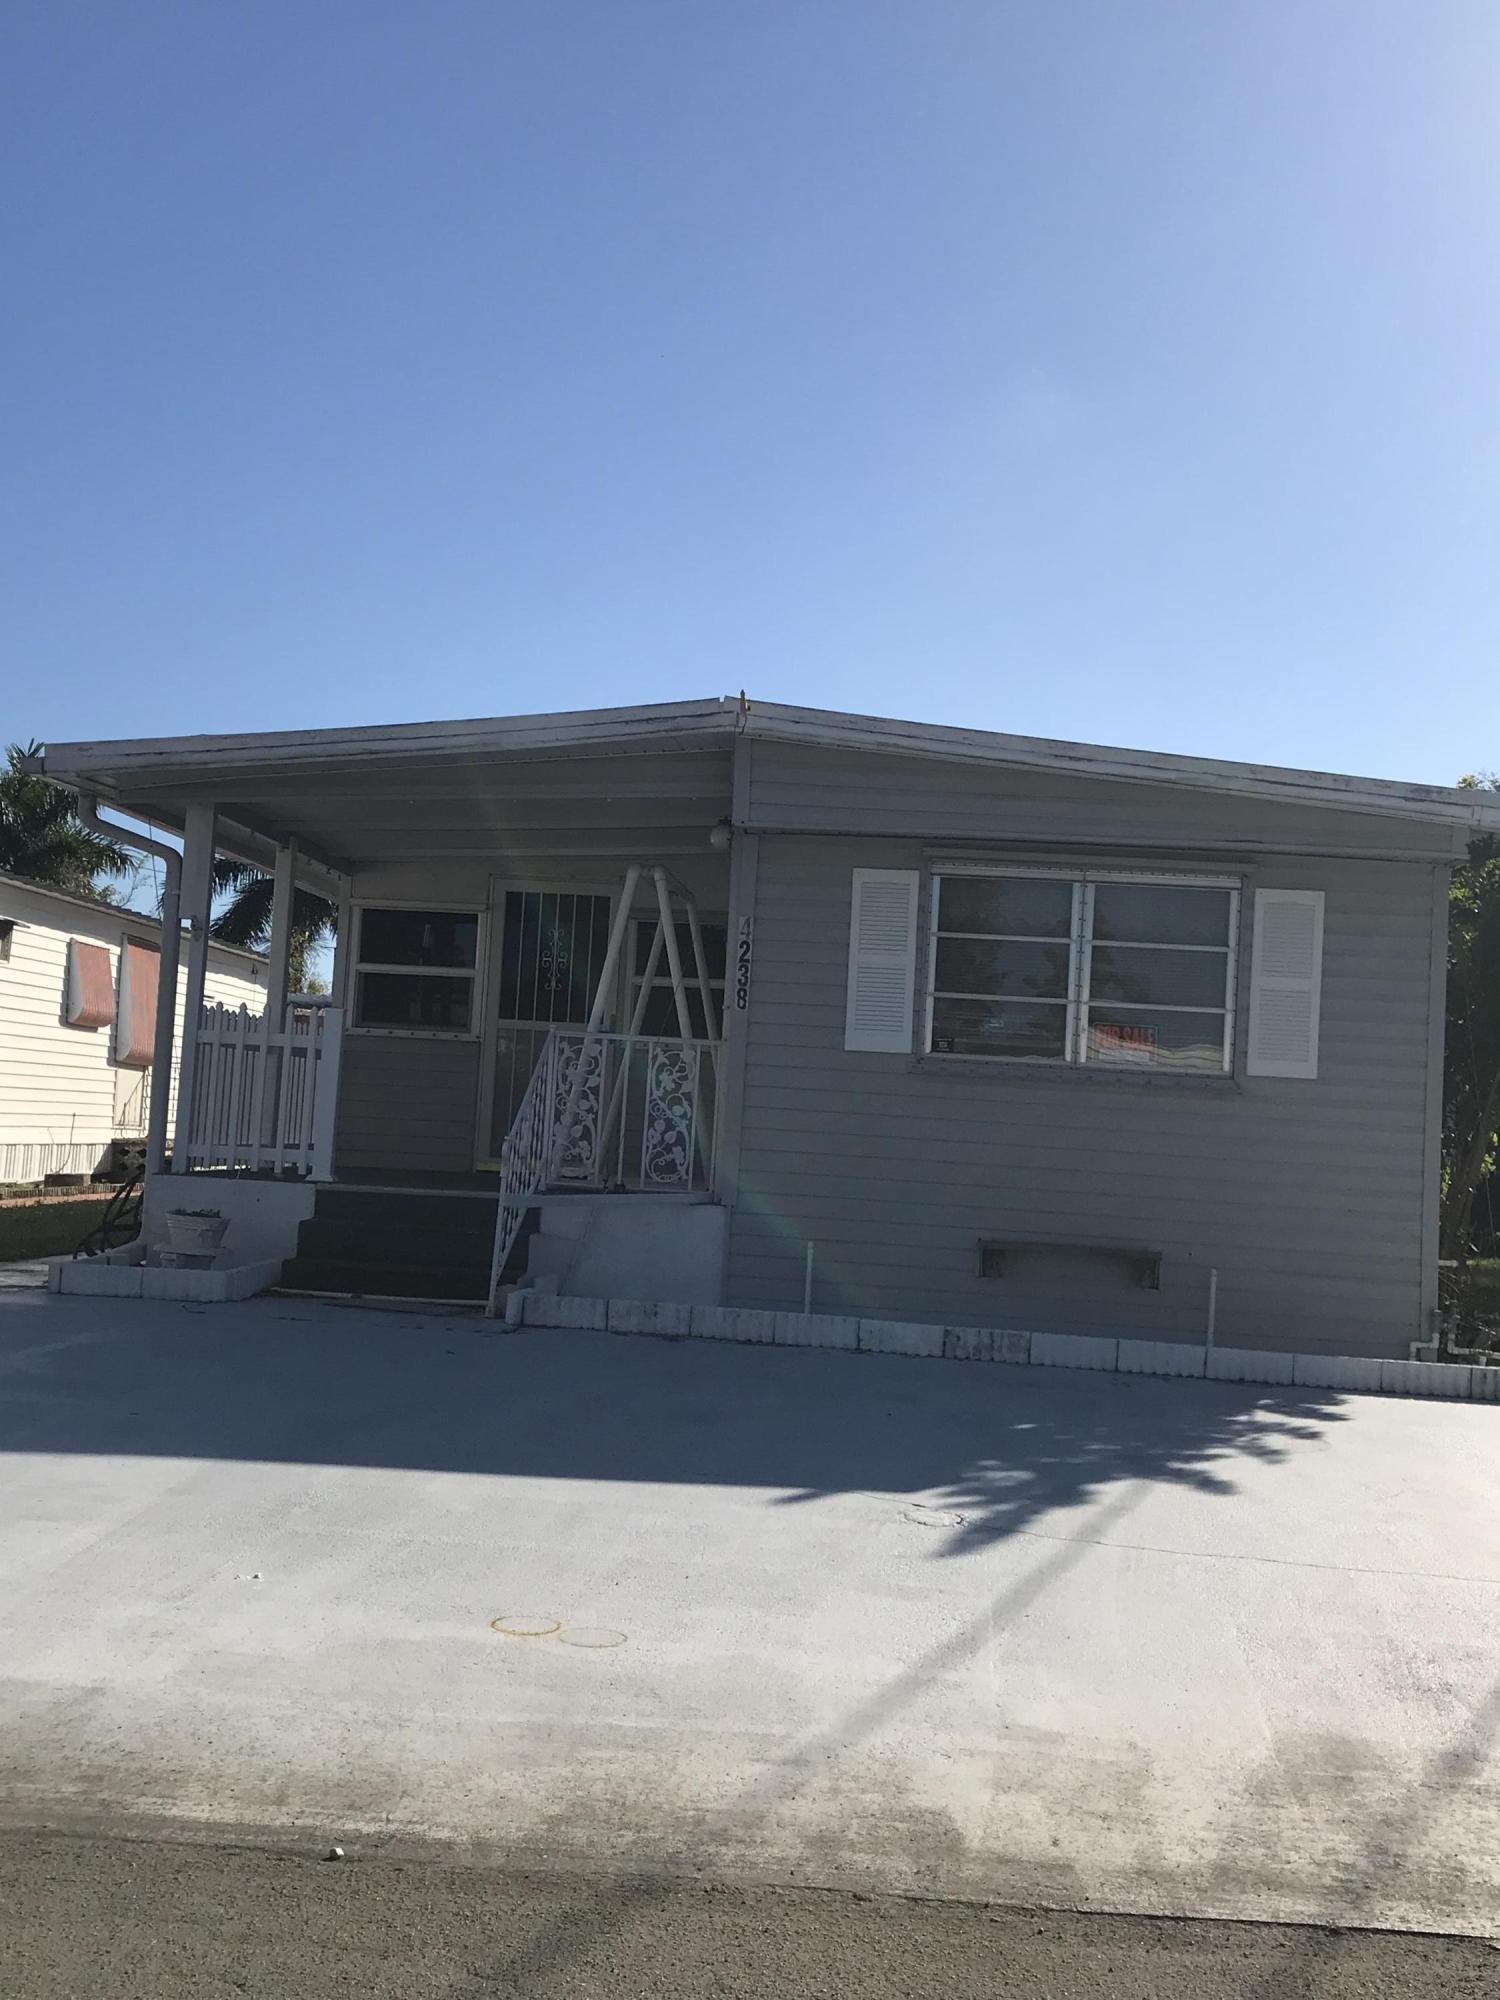 PARRY TRAILER VILLAGE home 4238 88th Place Boynton Beach FL 33436